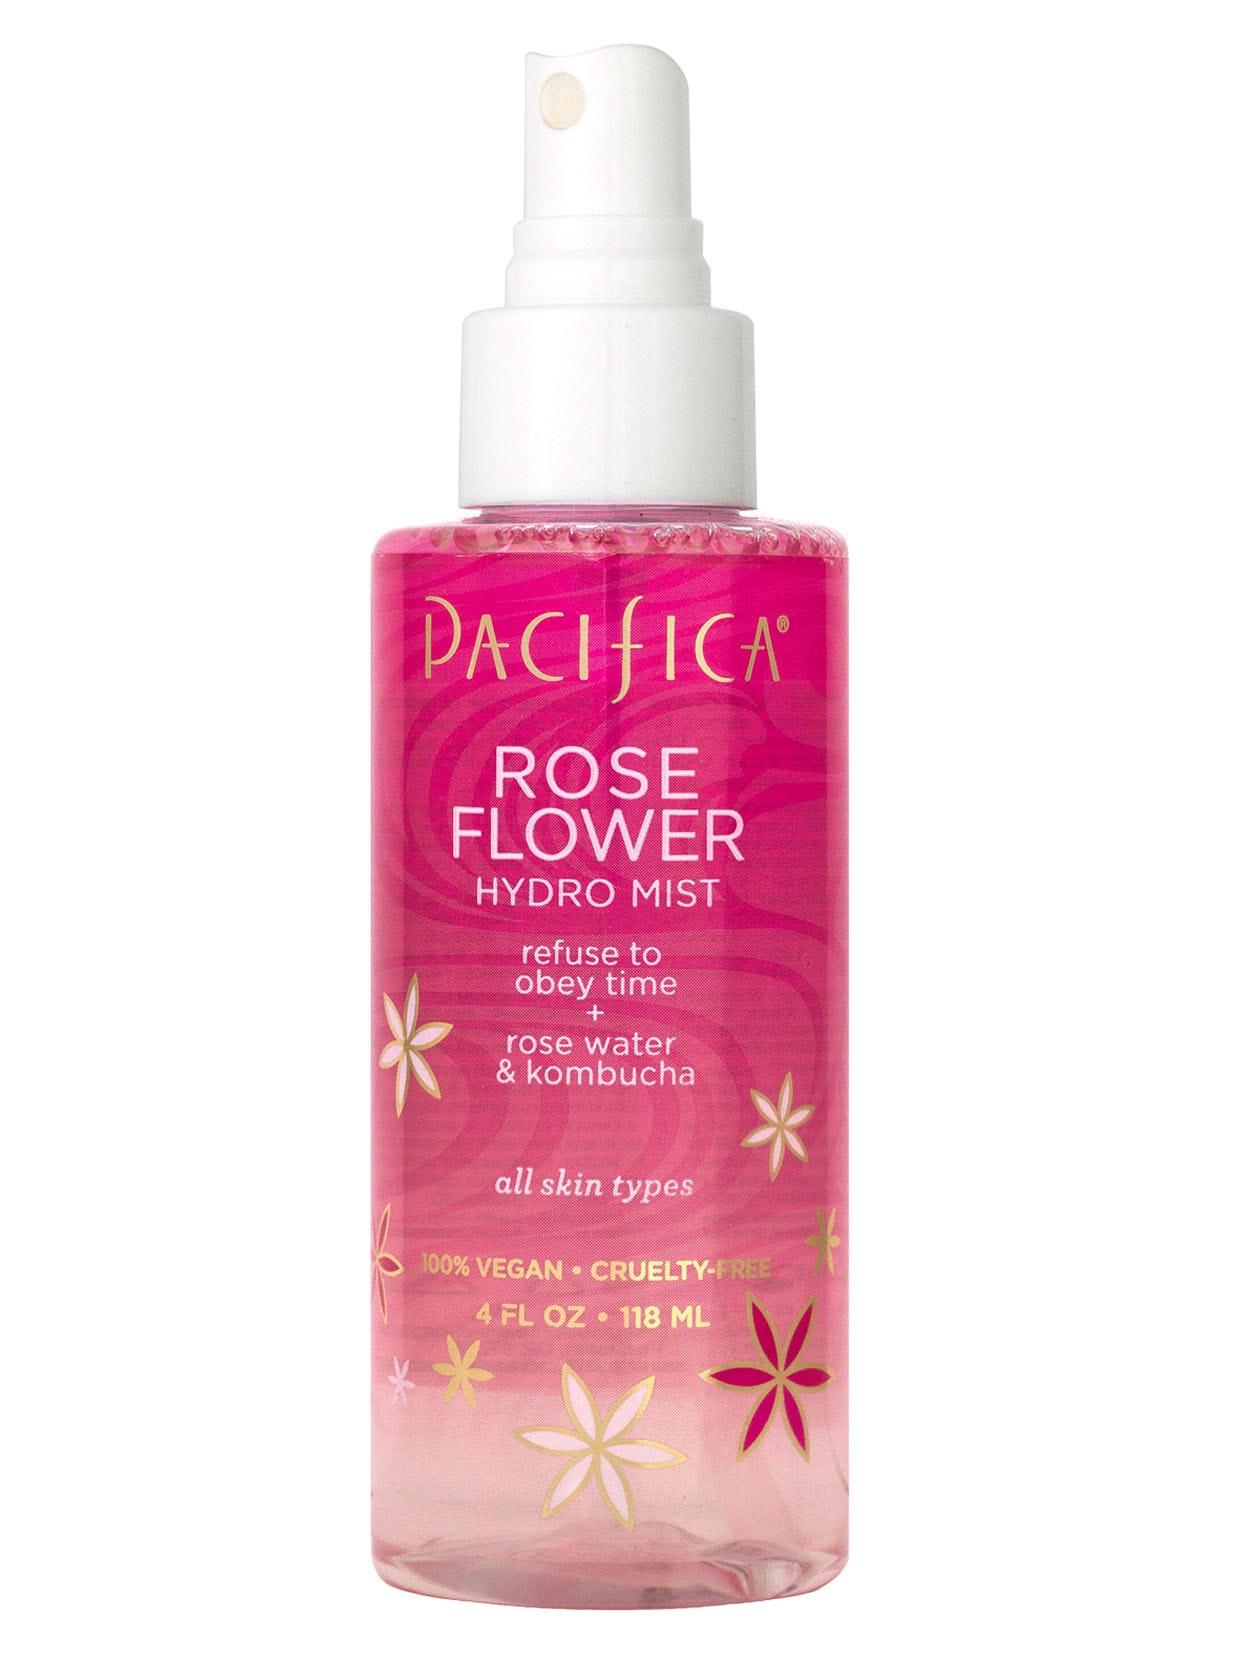 Pacifica Rose Flower Hydro Mist